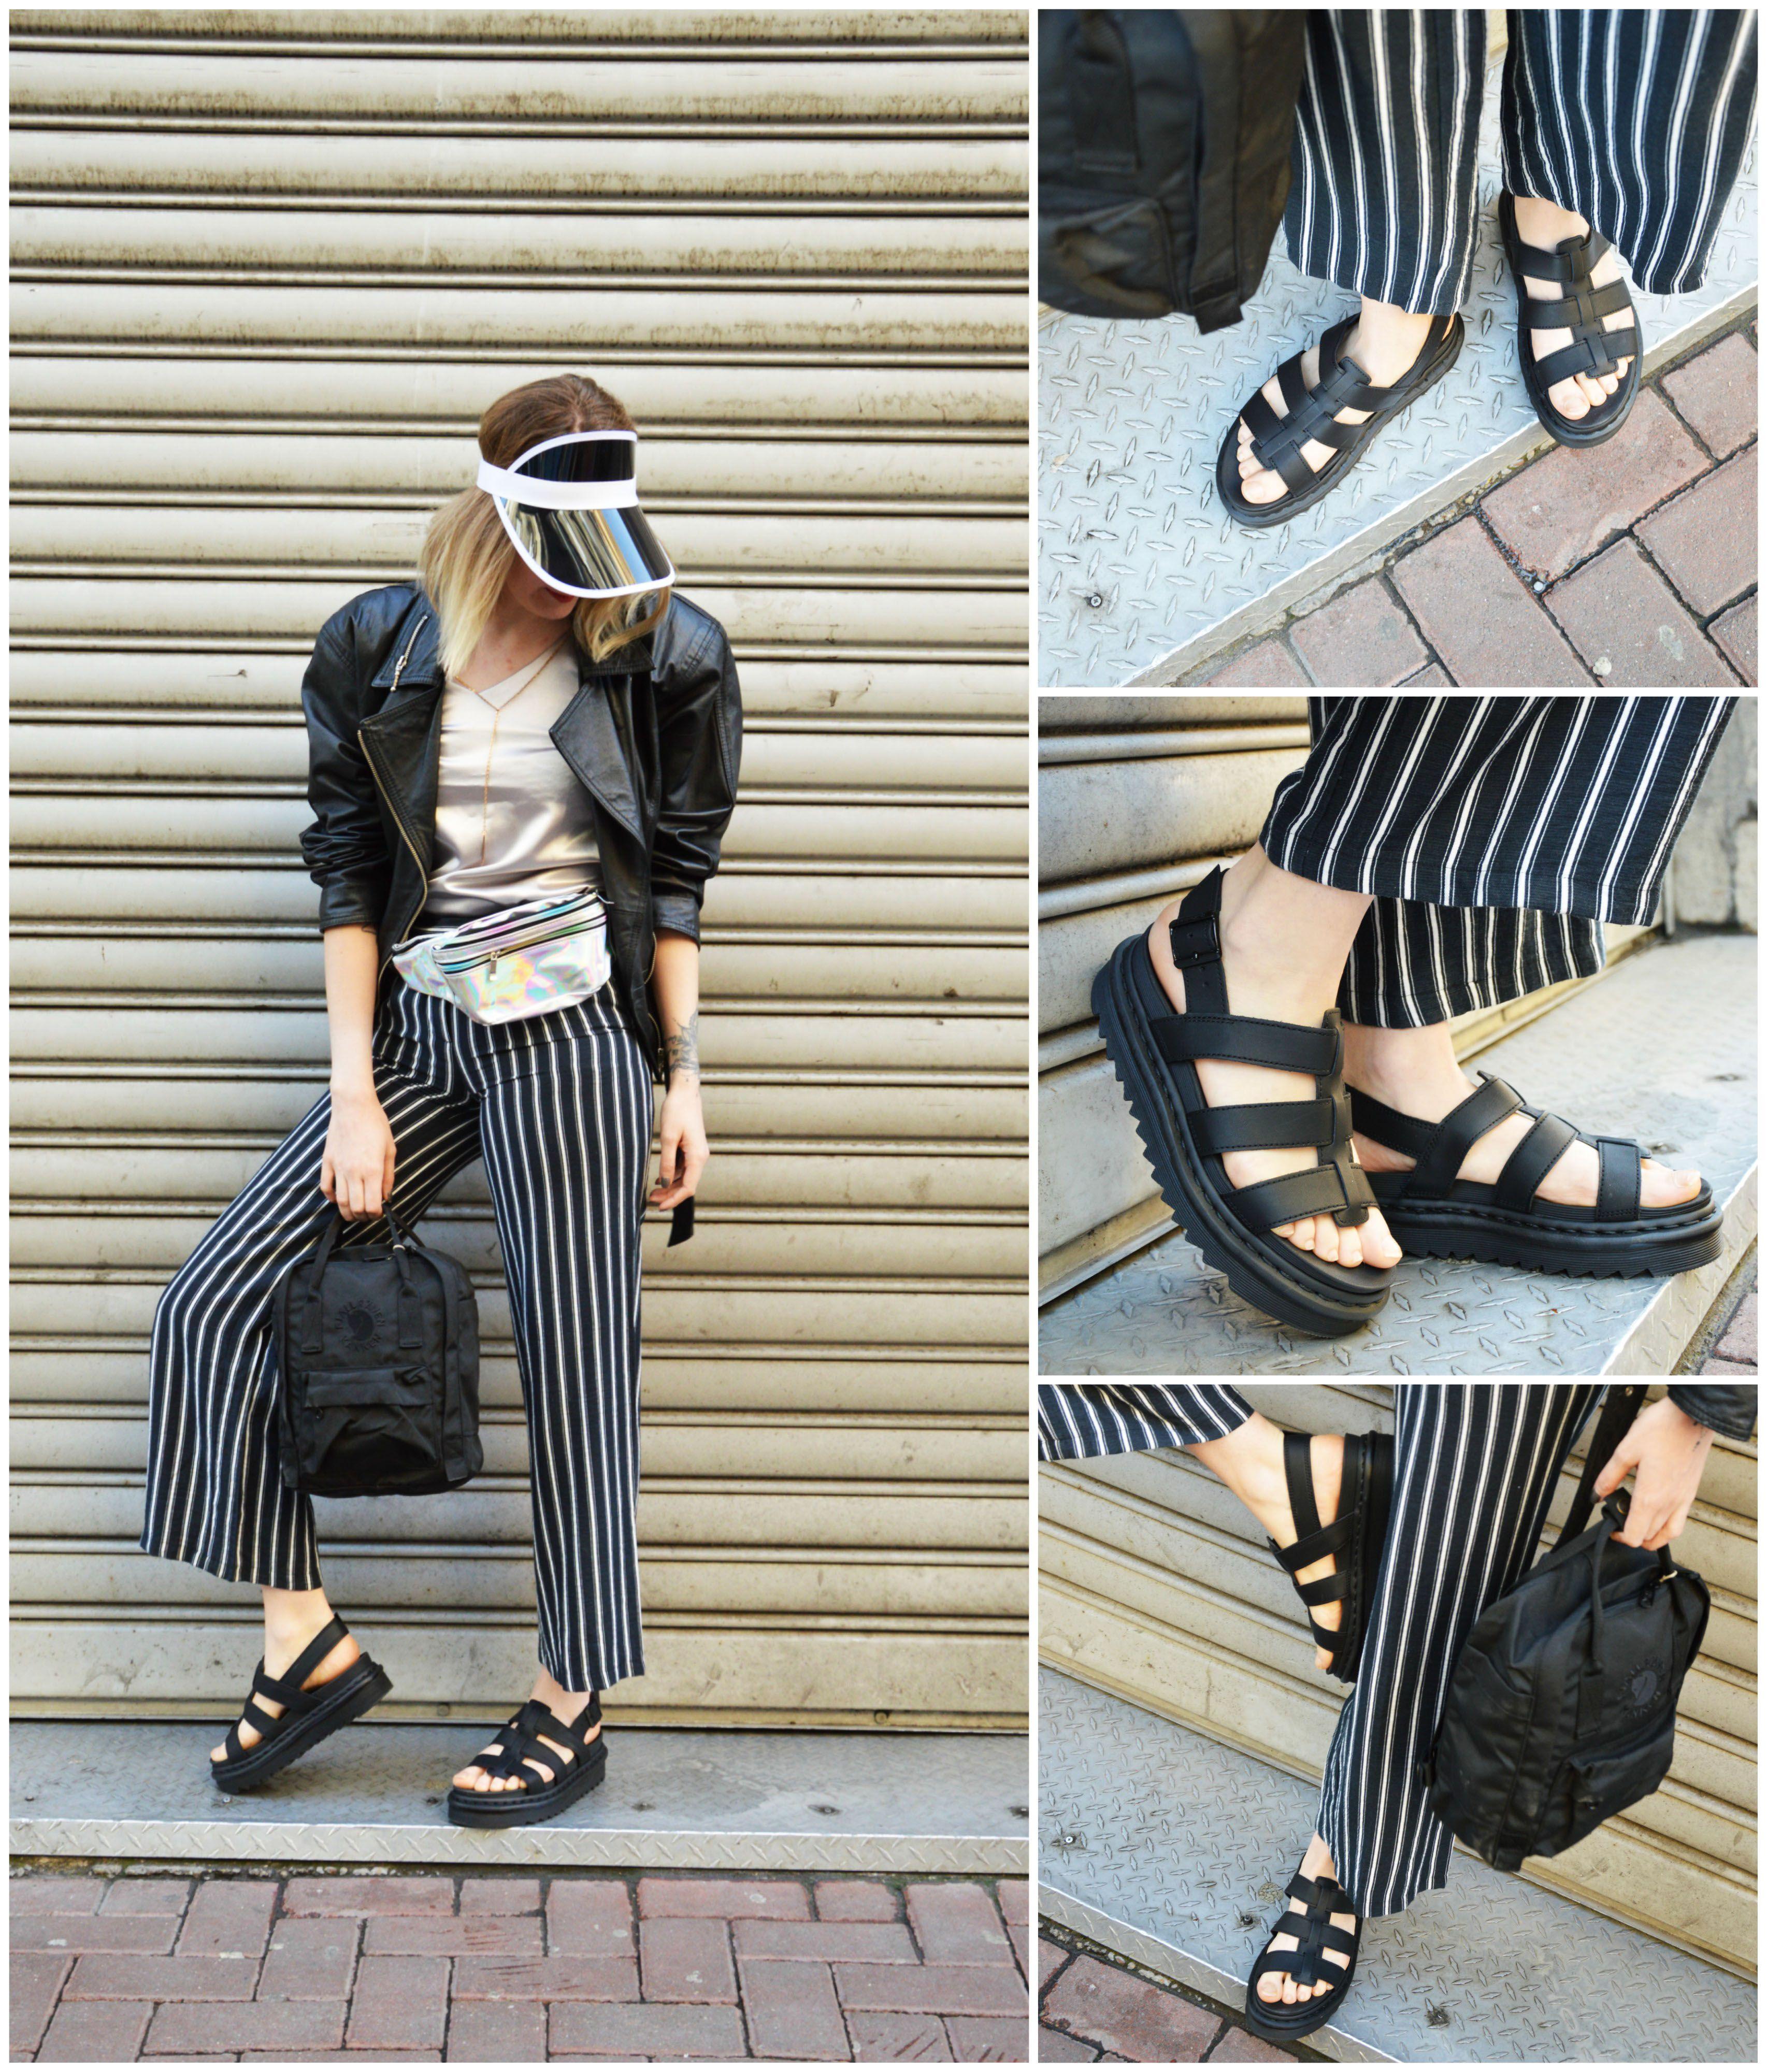 The spring/summer Dr. Martens footwear